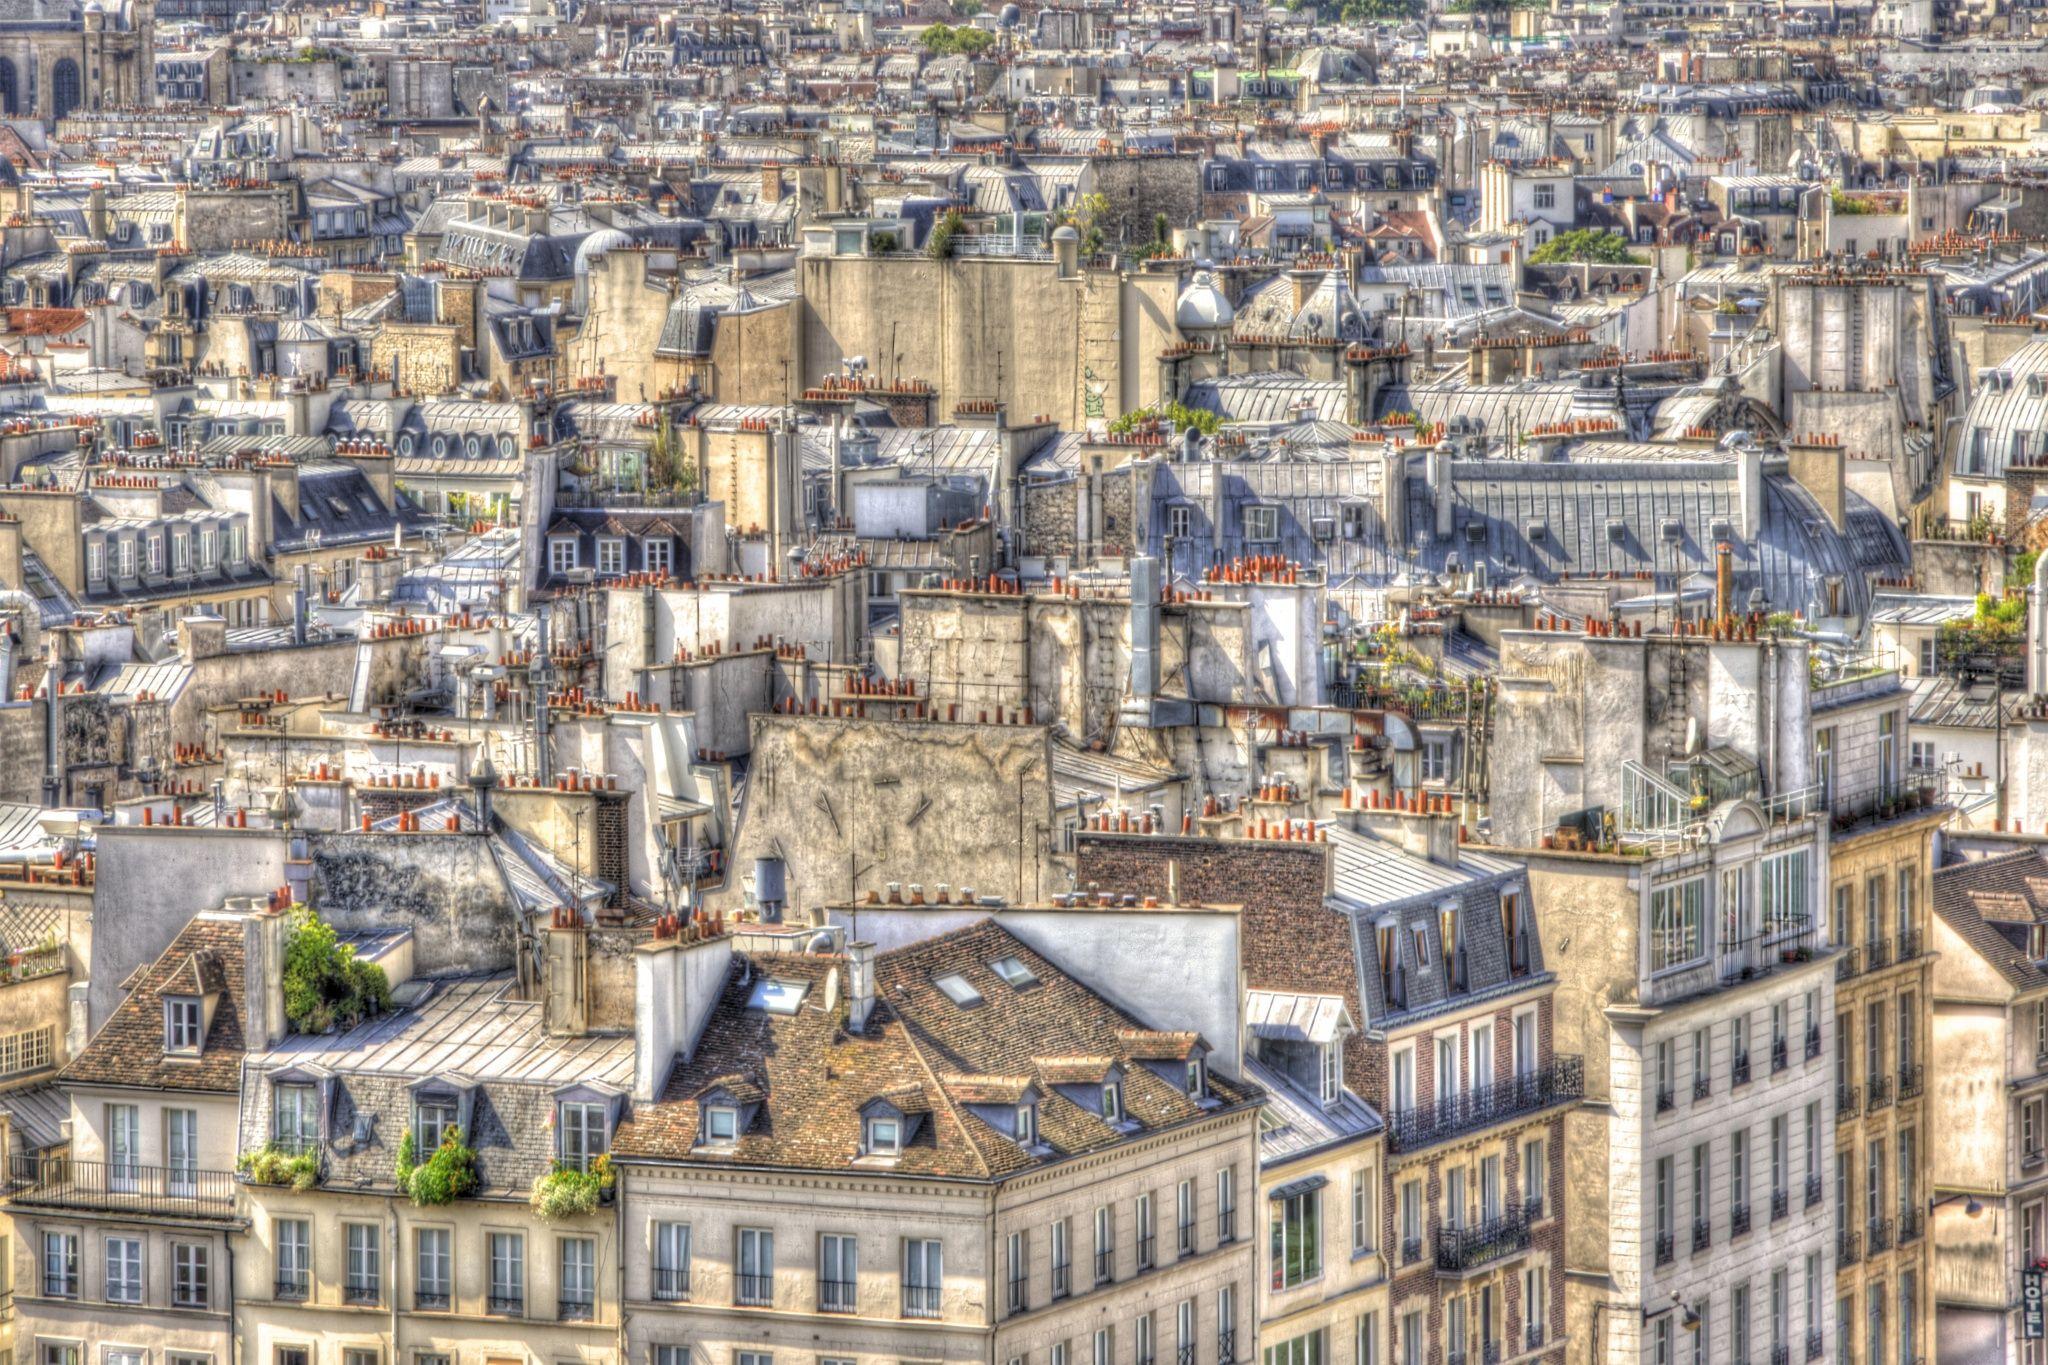 Rooftops of Paris III by Joe Reynolds - Photo 85177783 - 500px